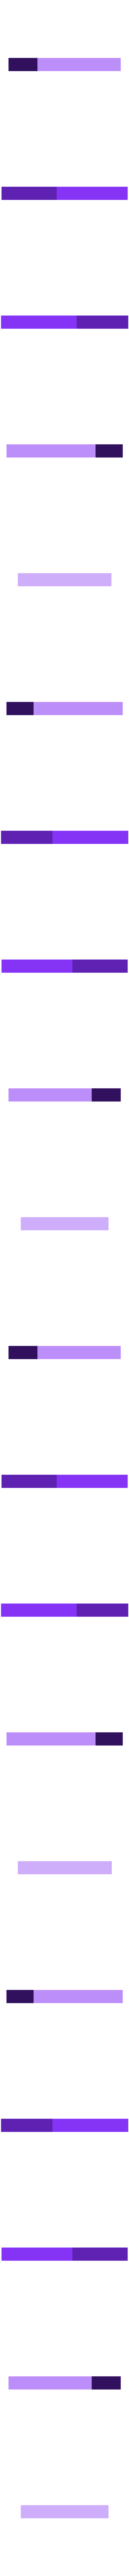 Raspberry_Pi_3B%2B_Sleeve.Raspberry_Pi_3B..Body5.stl Télécharger fichier STL gratuit Raspberry Pi 3B+ Sleeve • Design à imprimer en 3D, Wilko